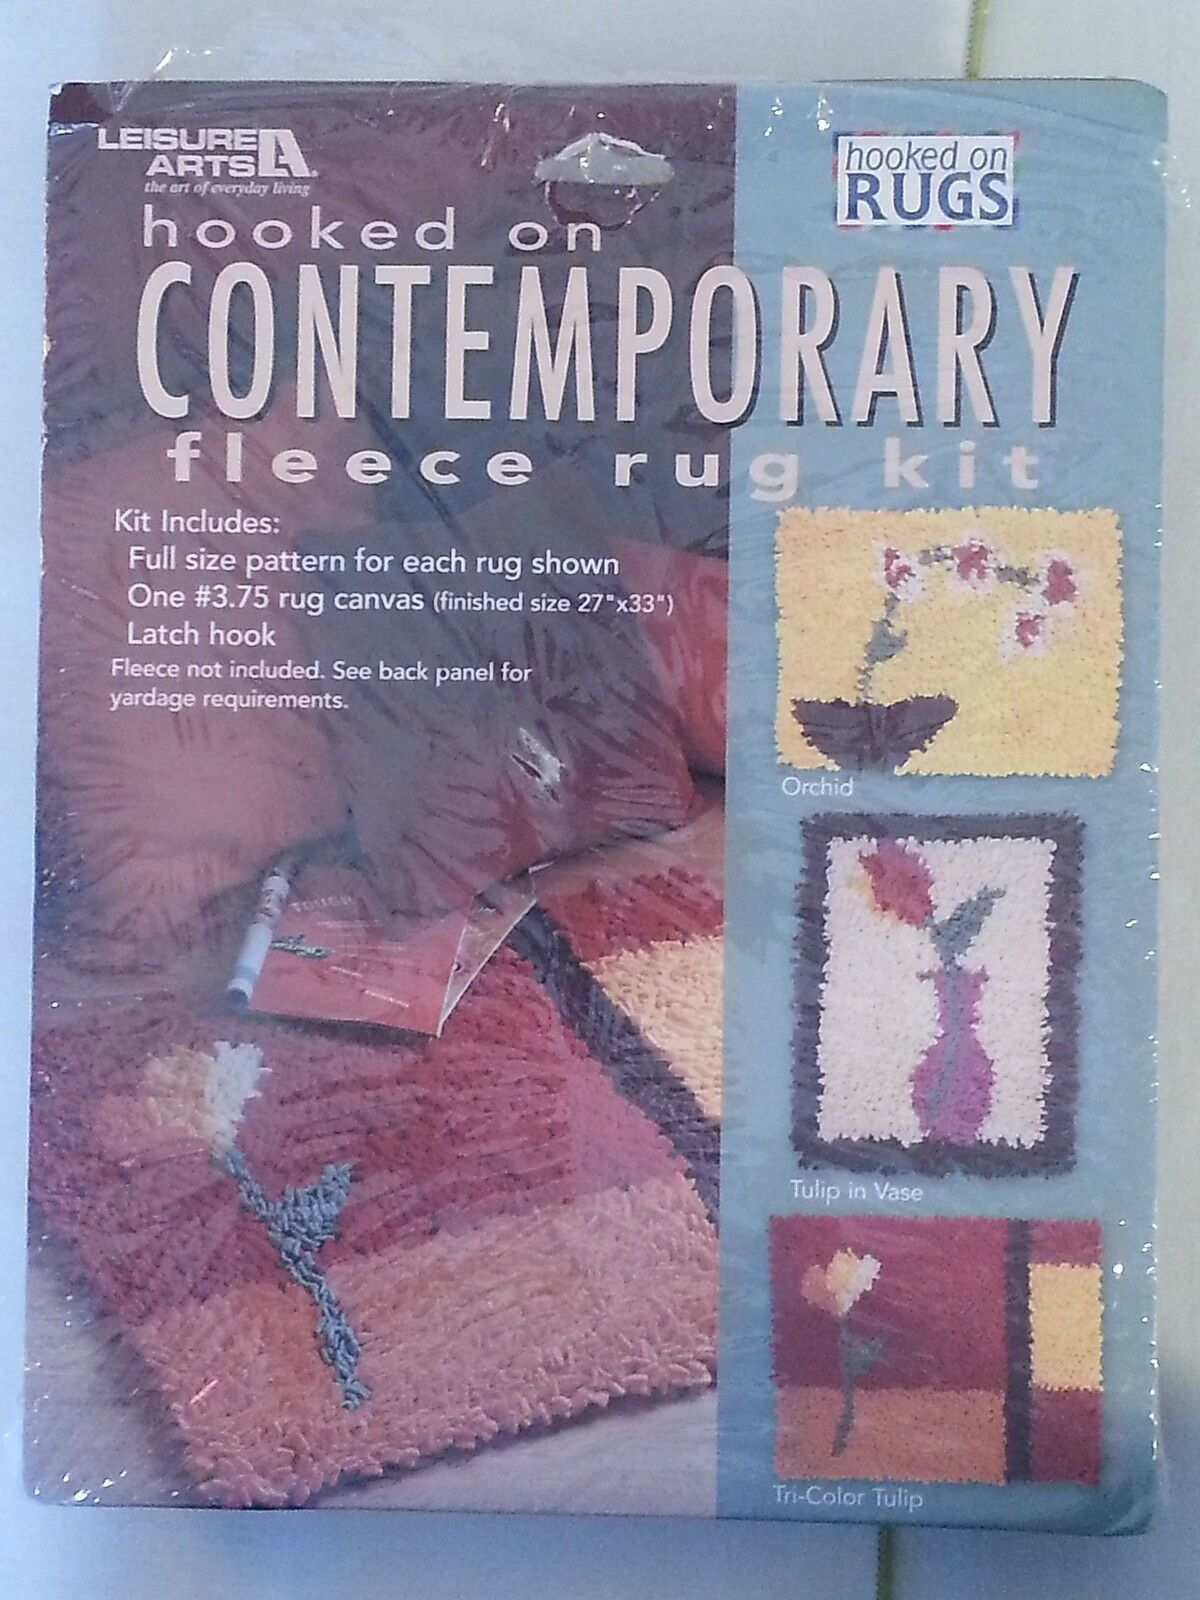 Single Stem Florals Leisure Arts Hooked On Contemporary Fleece Rug Kit 16002